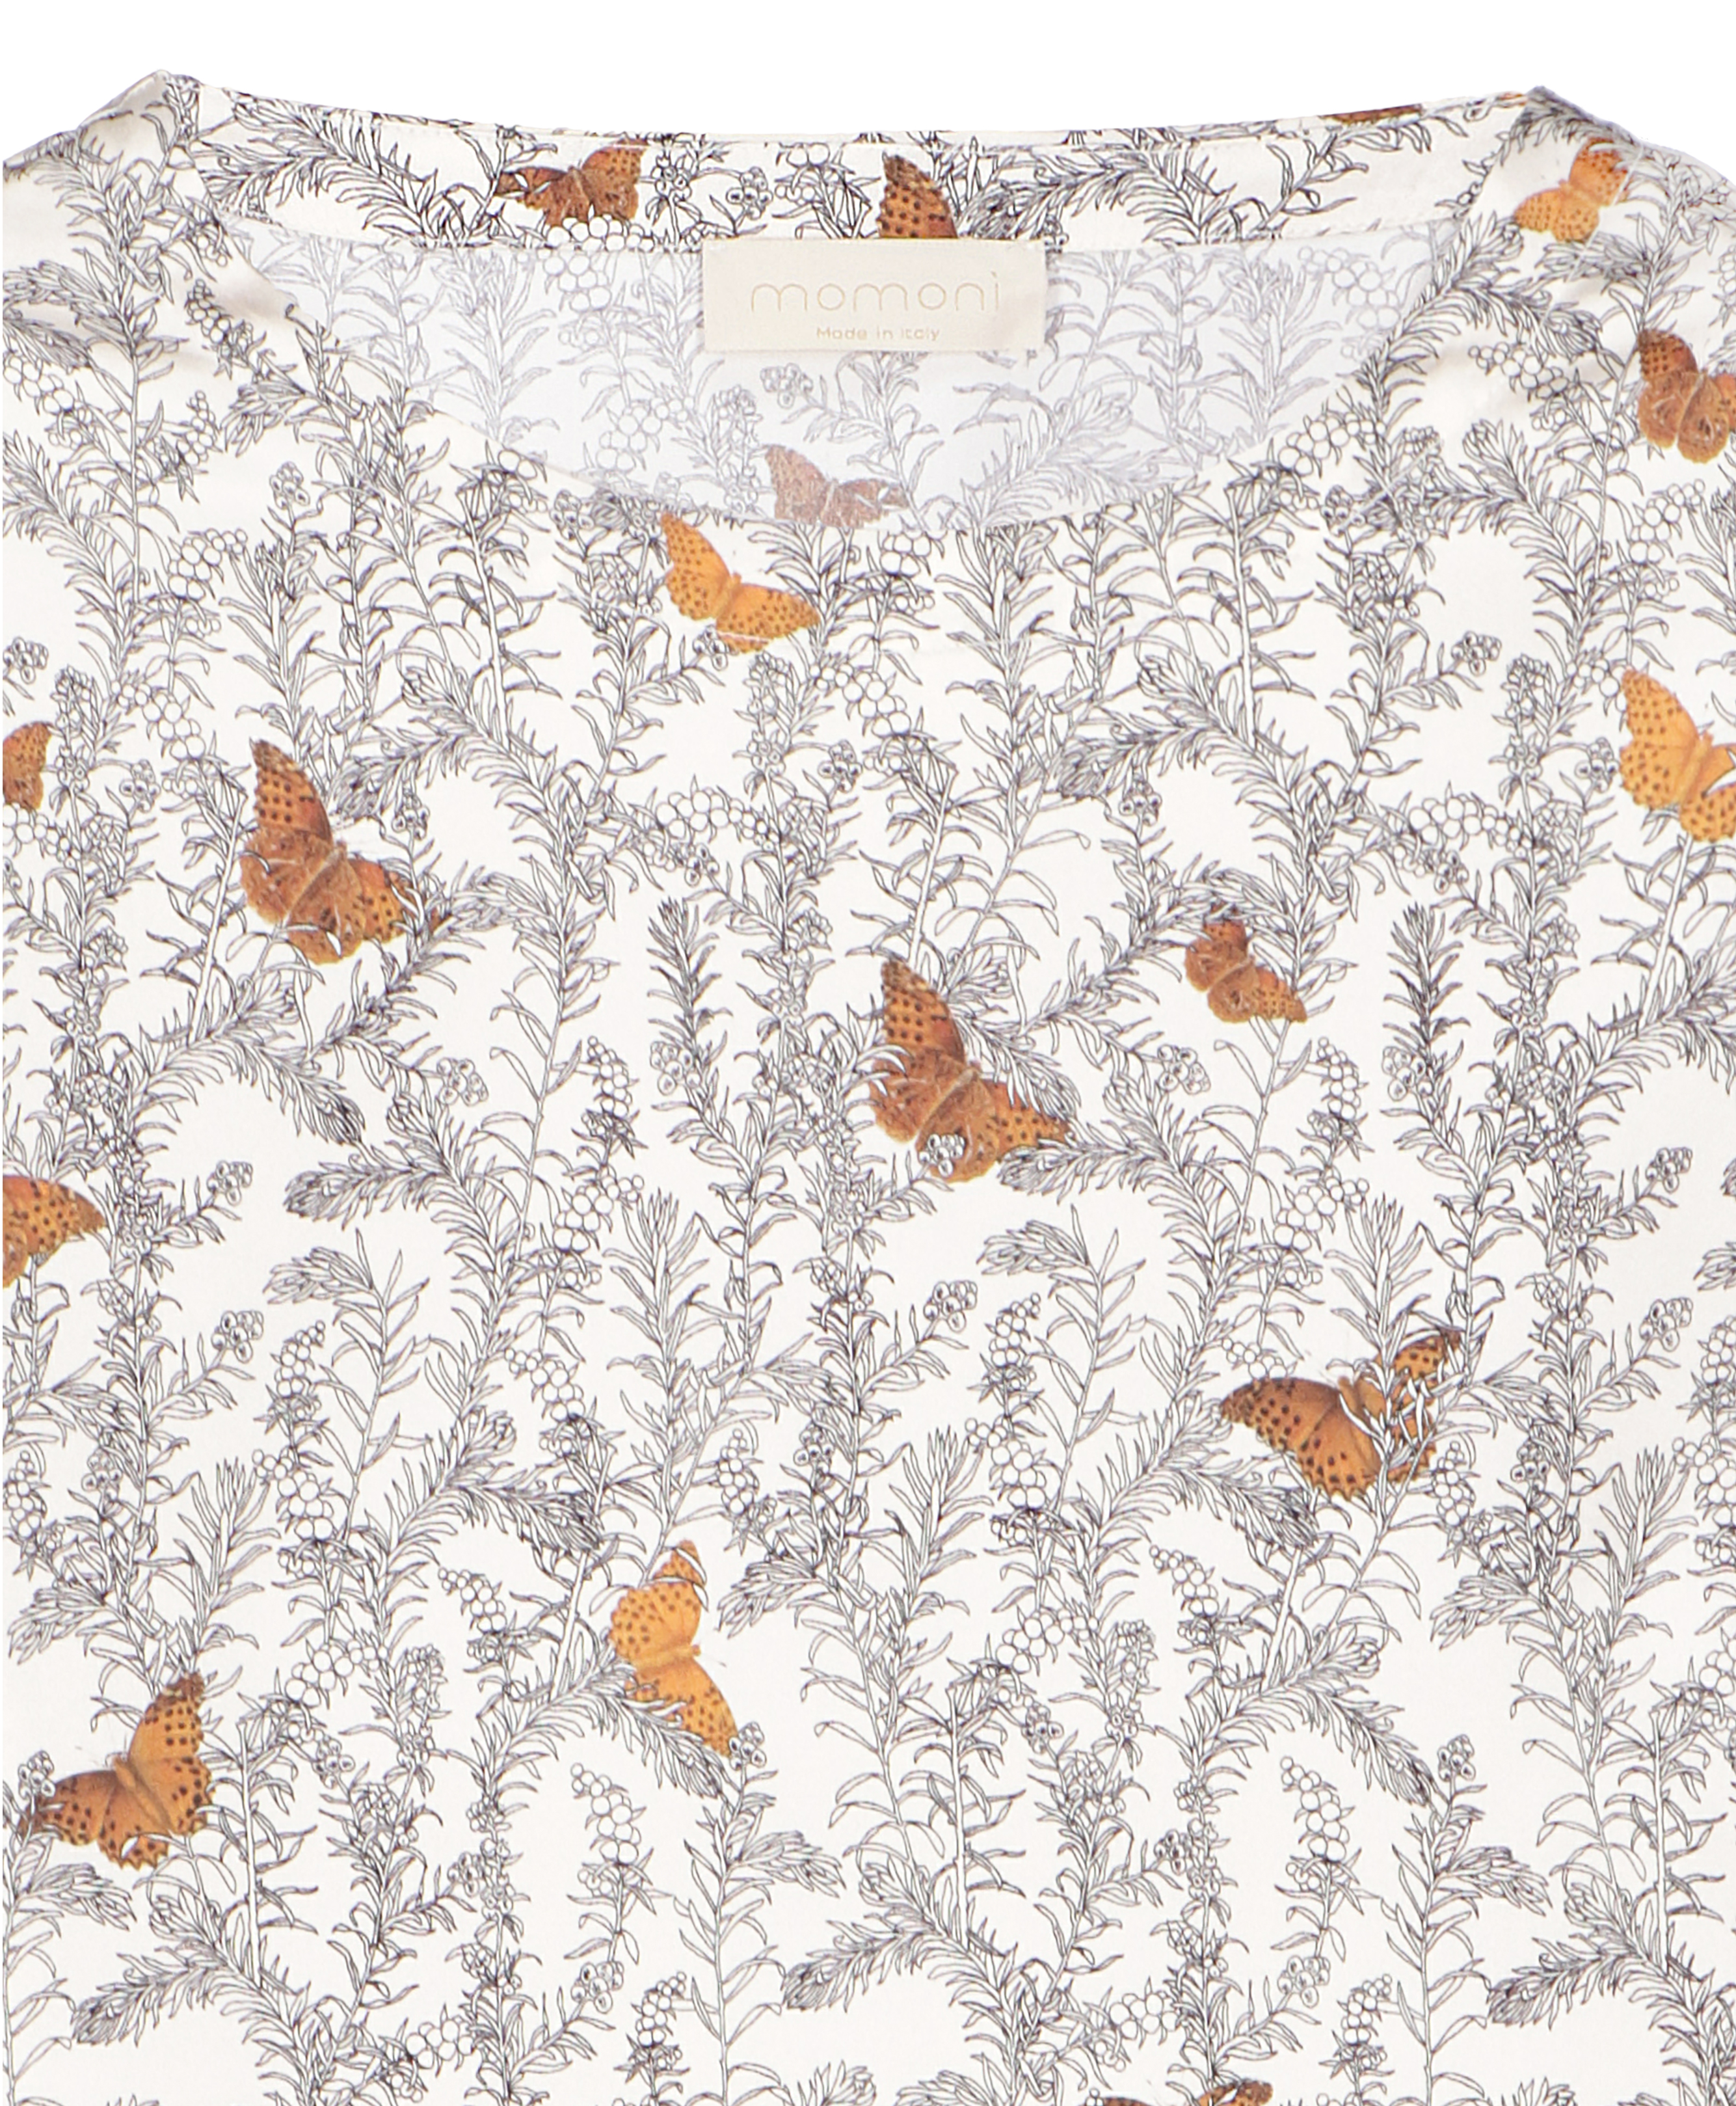 Bombolone patterned blouse with butterflies MOMONI | Blouse | MOBL0041075